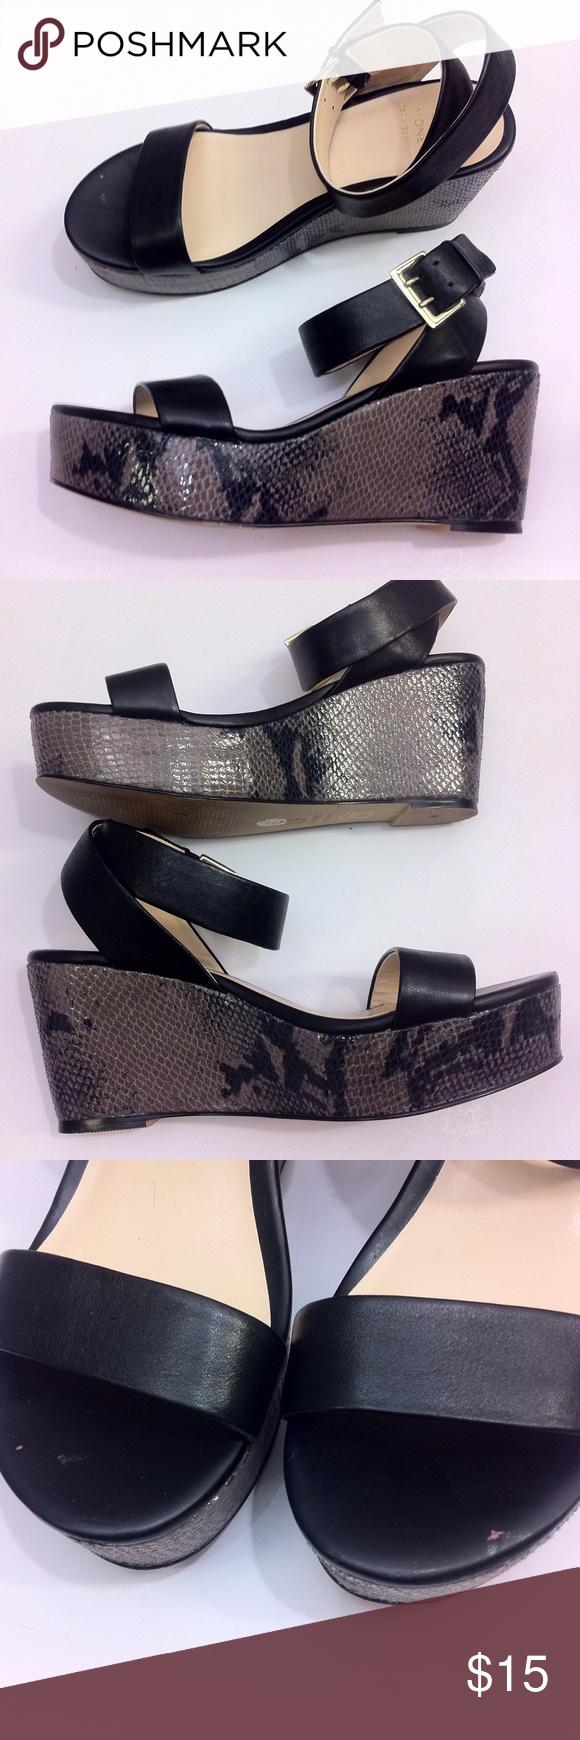 0a49cd5cccc6 Monet black leather strap wedge platform sandals 6 Monet designed in Italy Platform  wedge sandals -